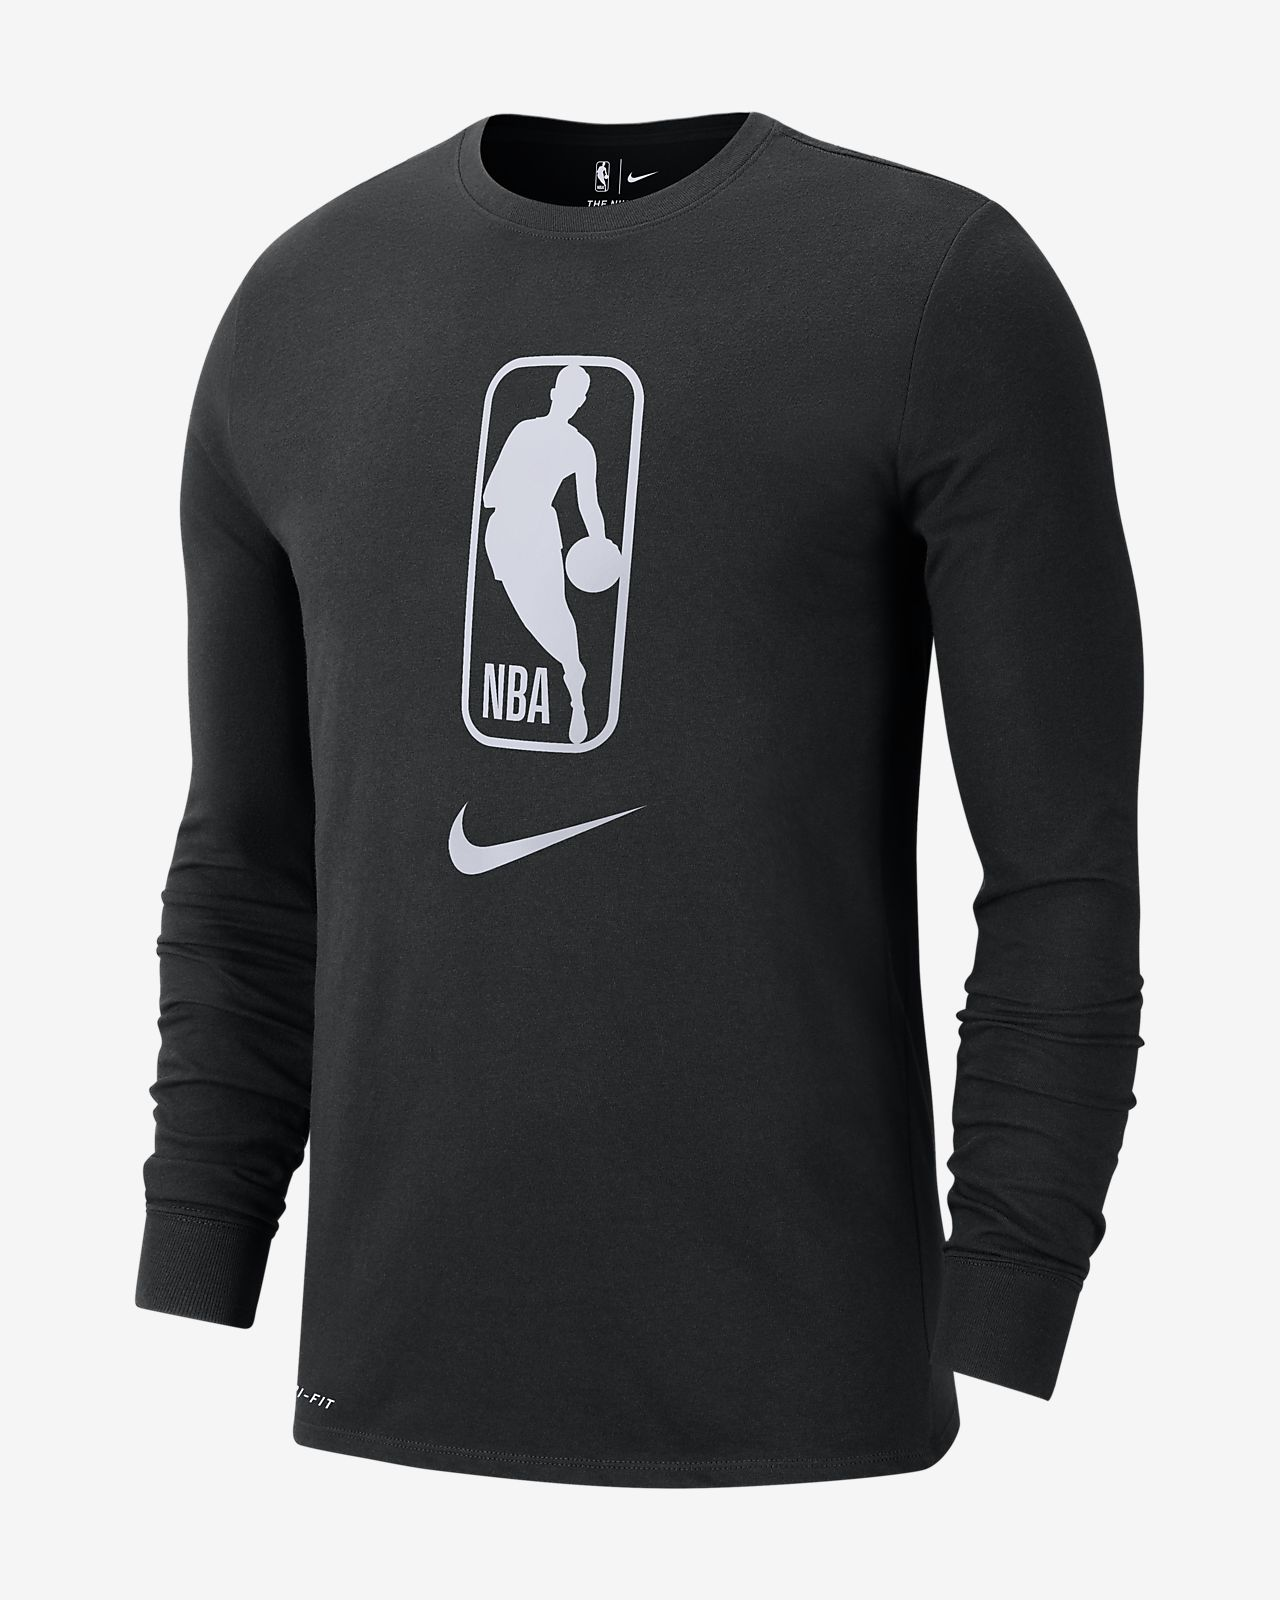 Nike Dri-FIT Men's Long-Sleeve NBA T-Shirt